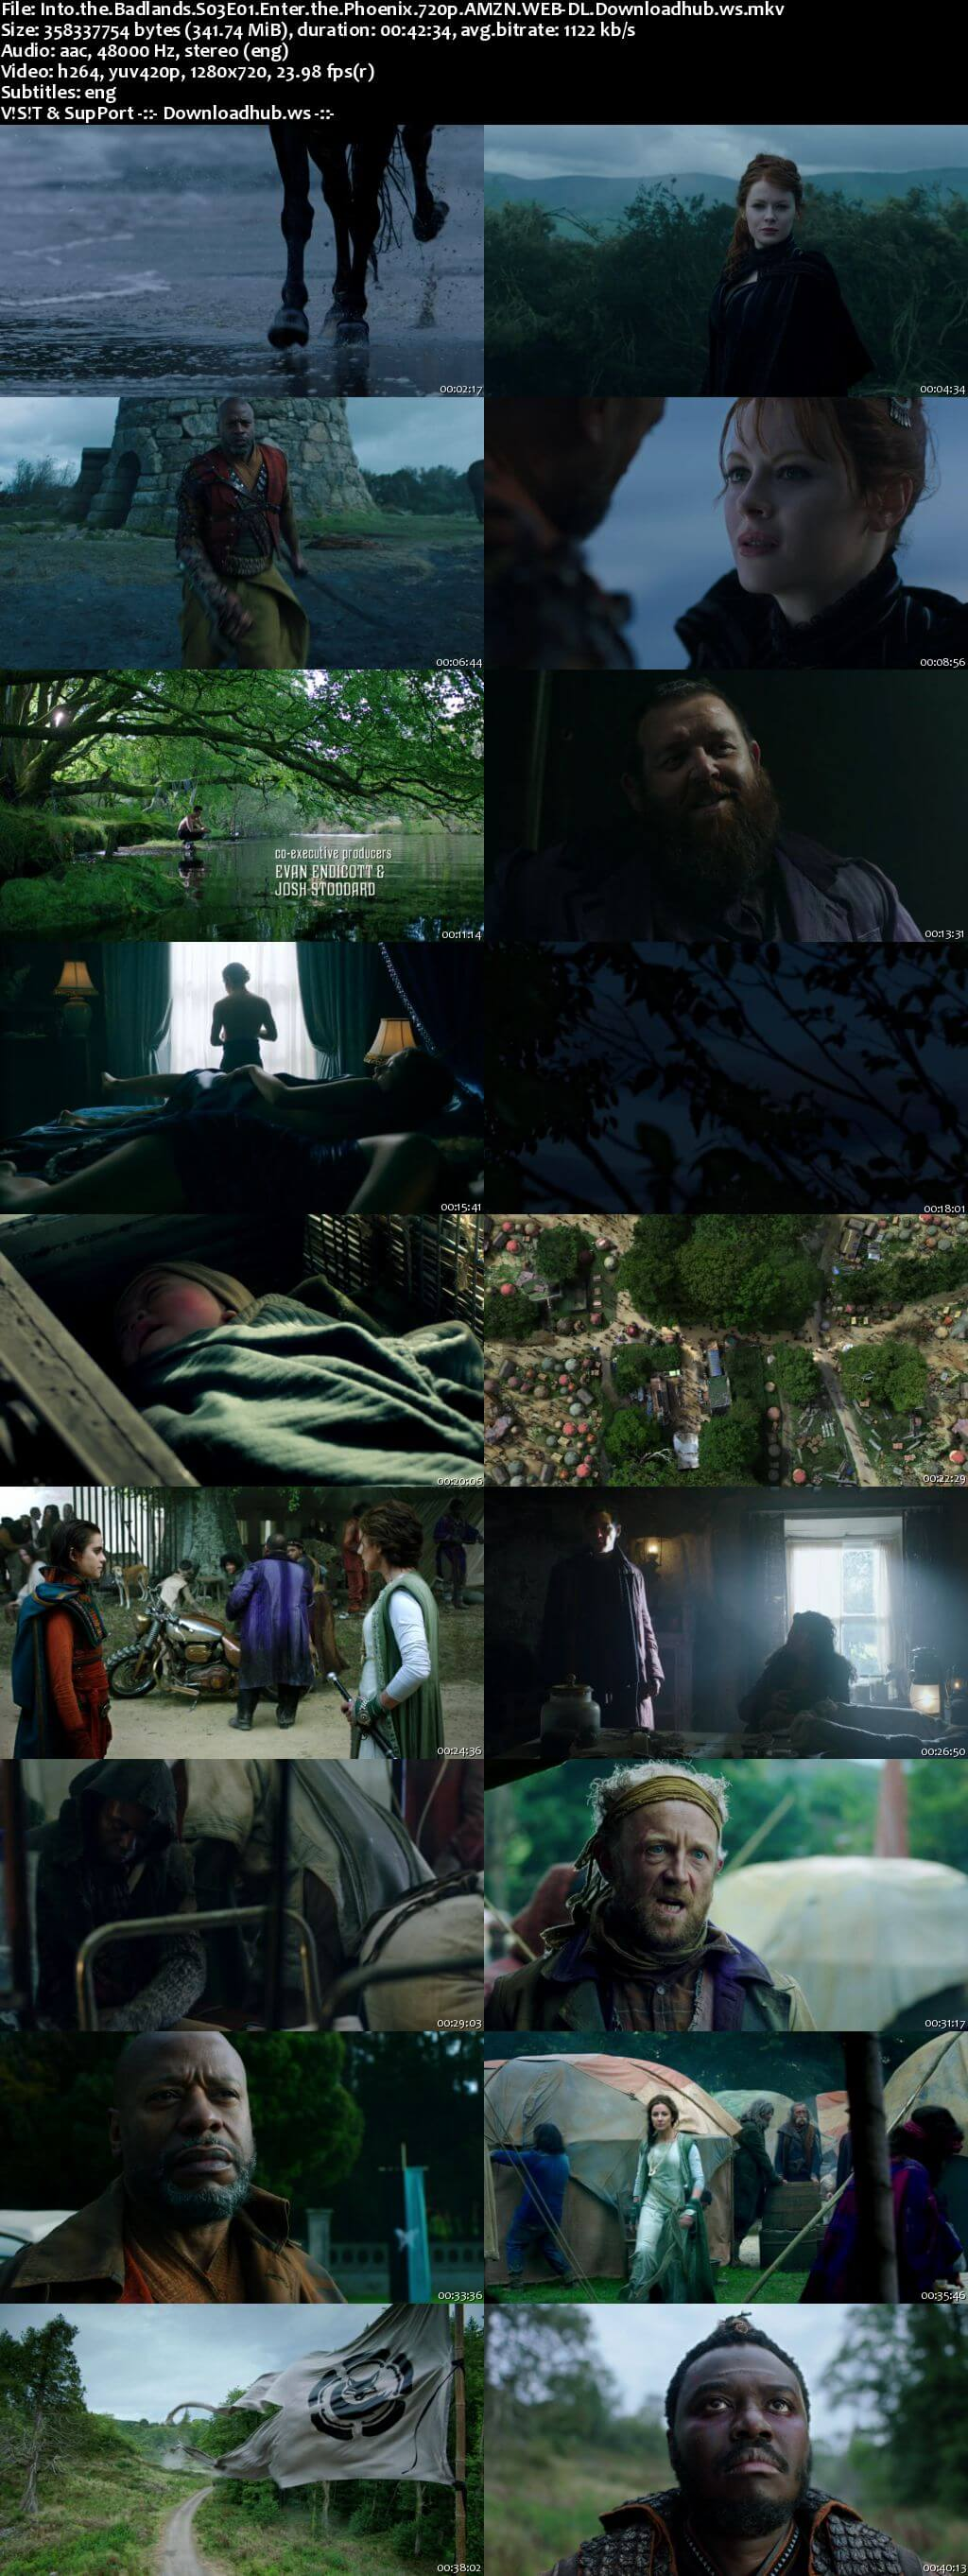 Into the Badlands S03E01 340MB WEB-DL 720p x264 ESubs